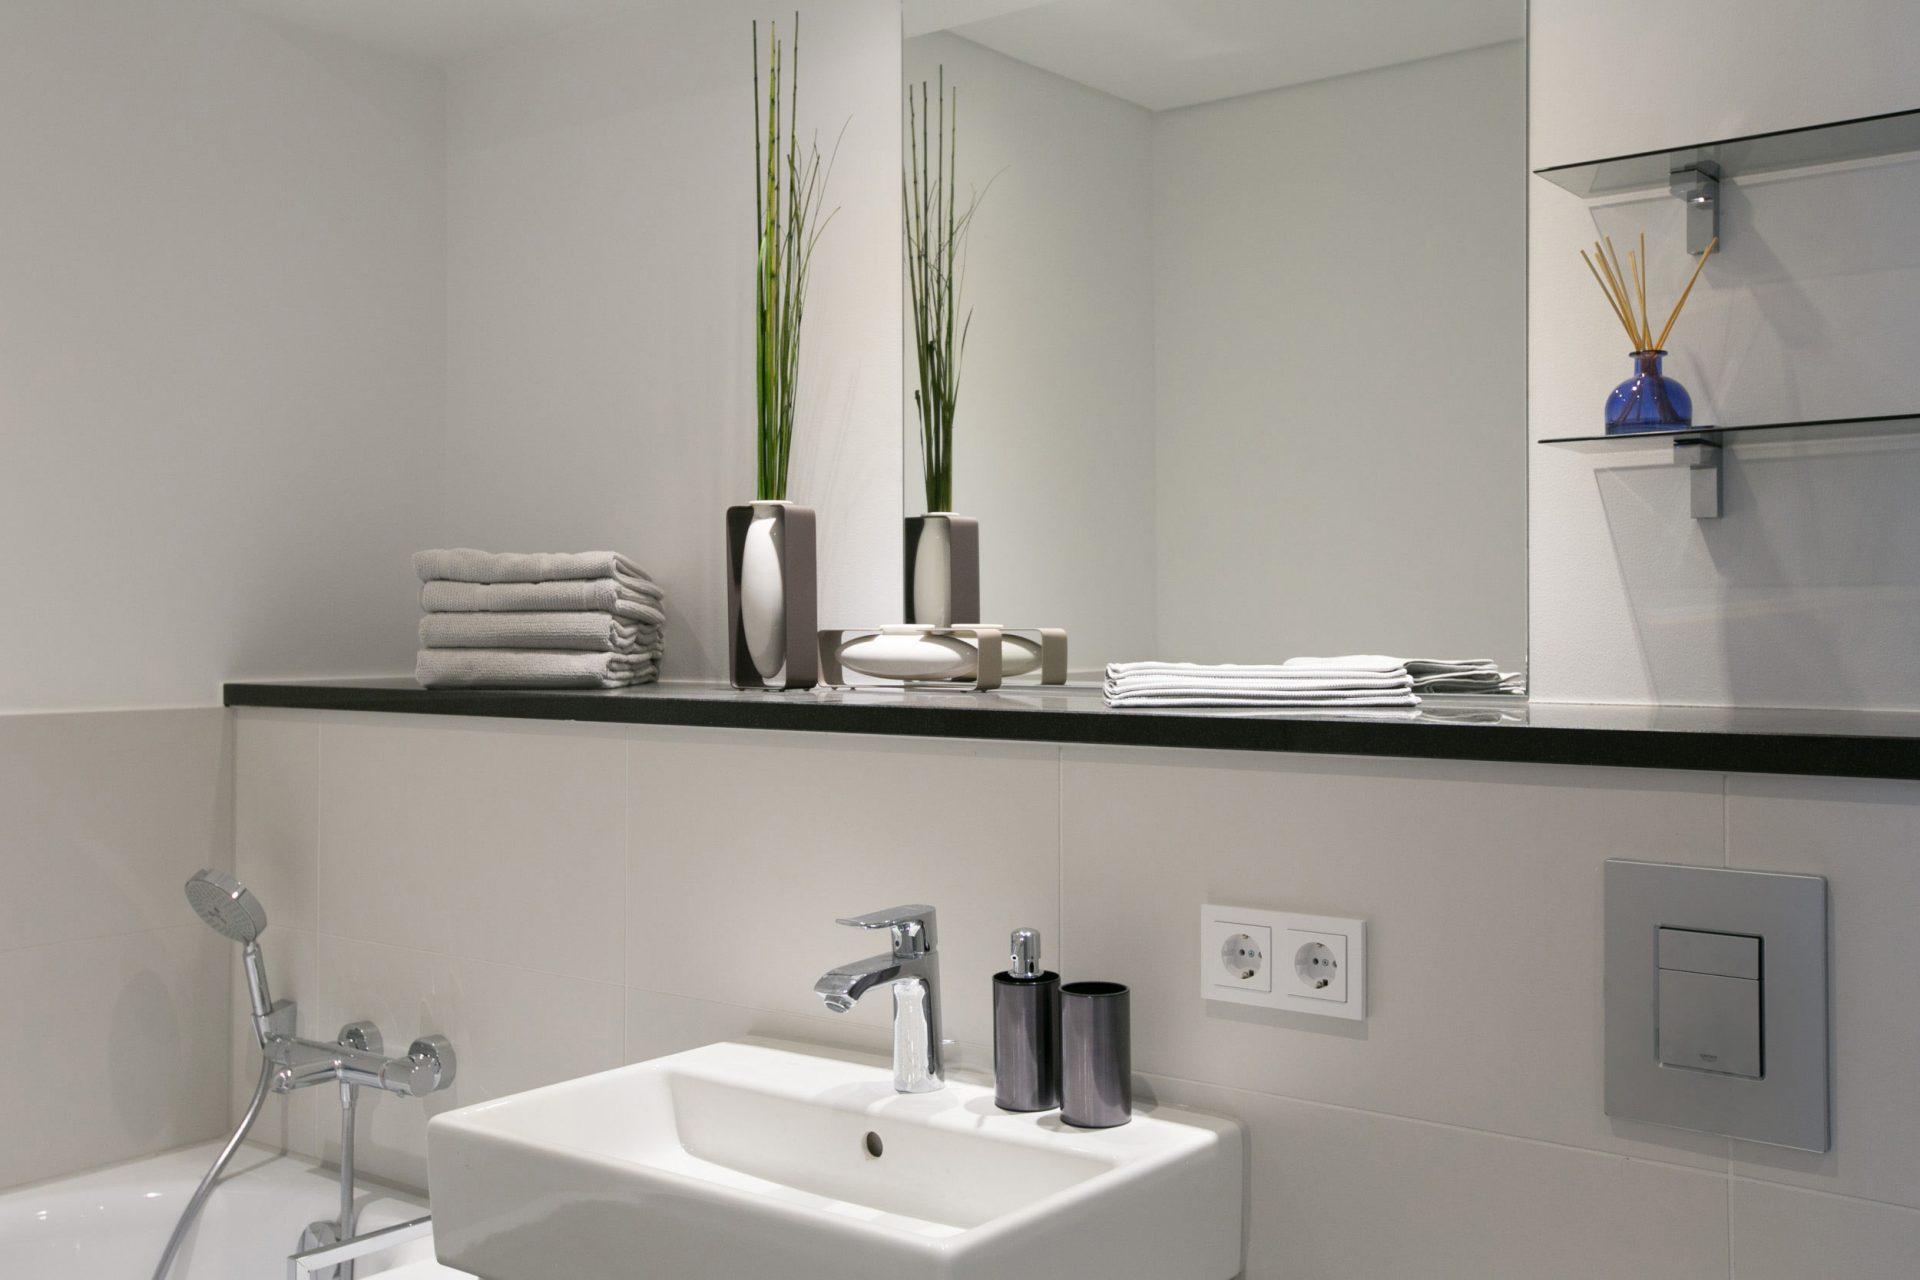 Immobilienfotografie Badezimmer ©offenblende.de